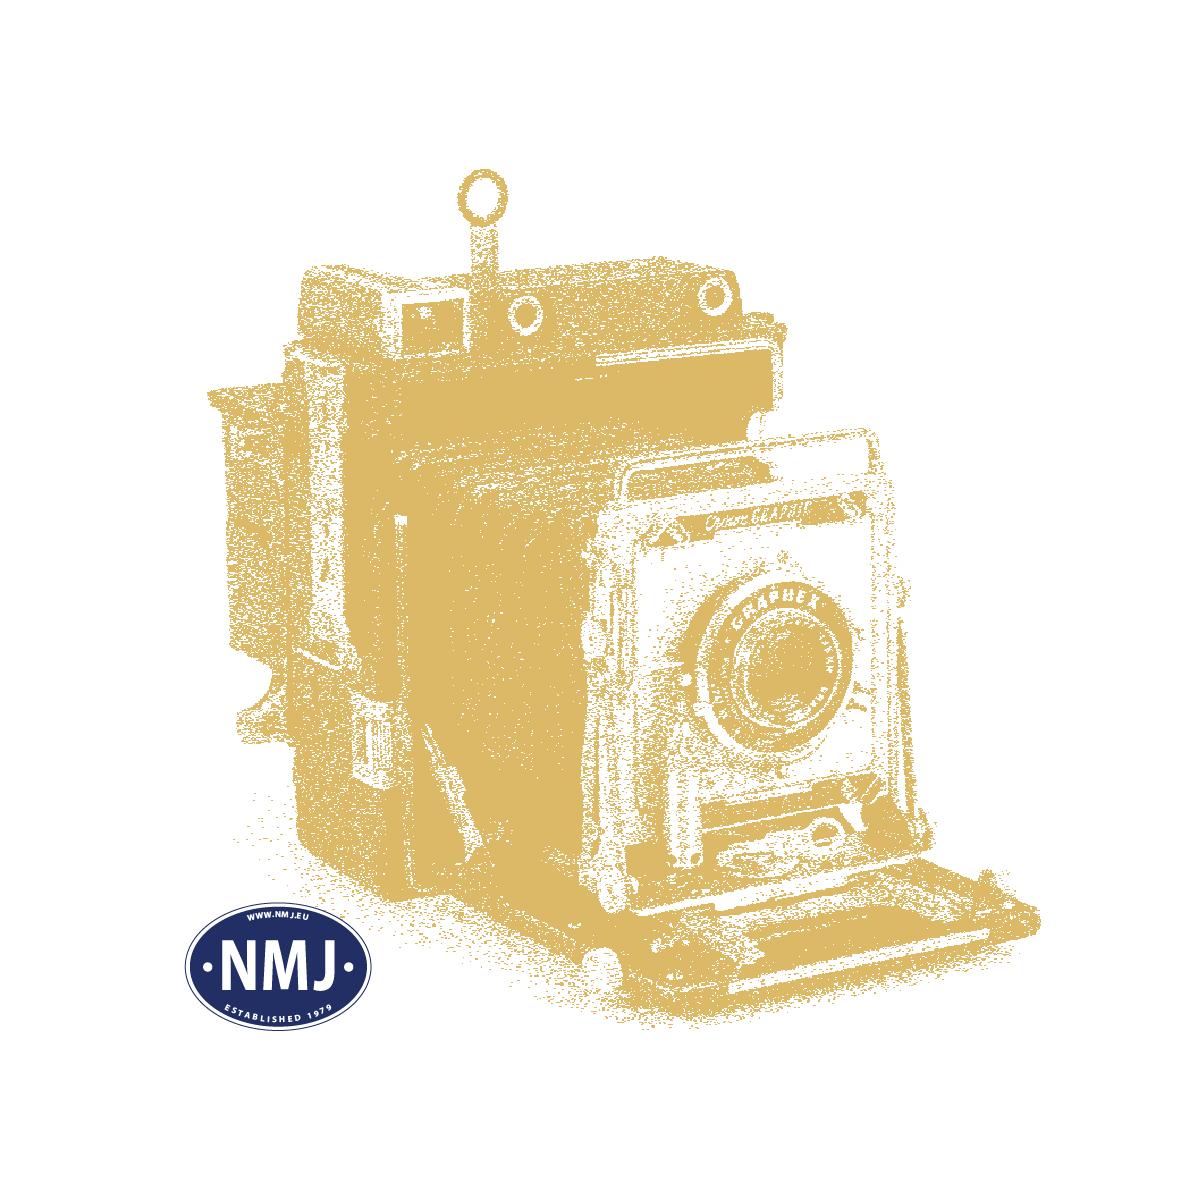 NMJT87.202 - NMJ Topline NSB El11.2145, DC